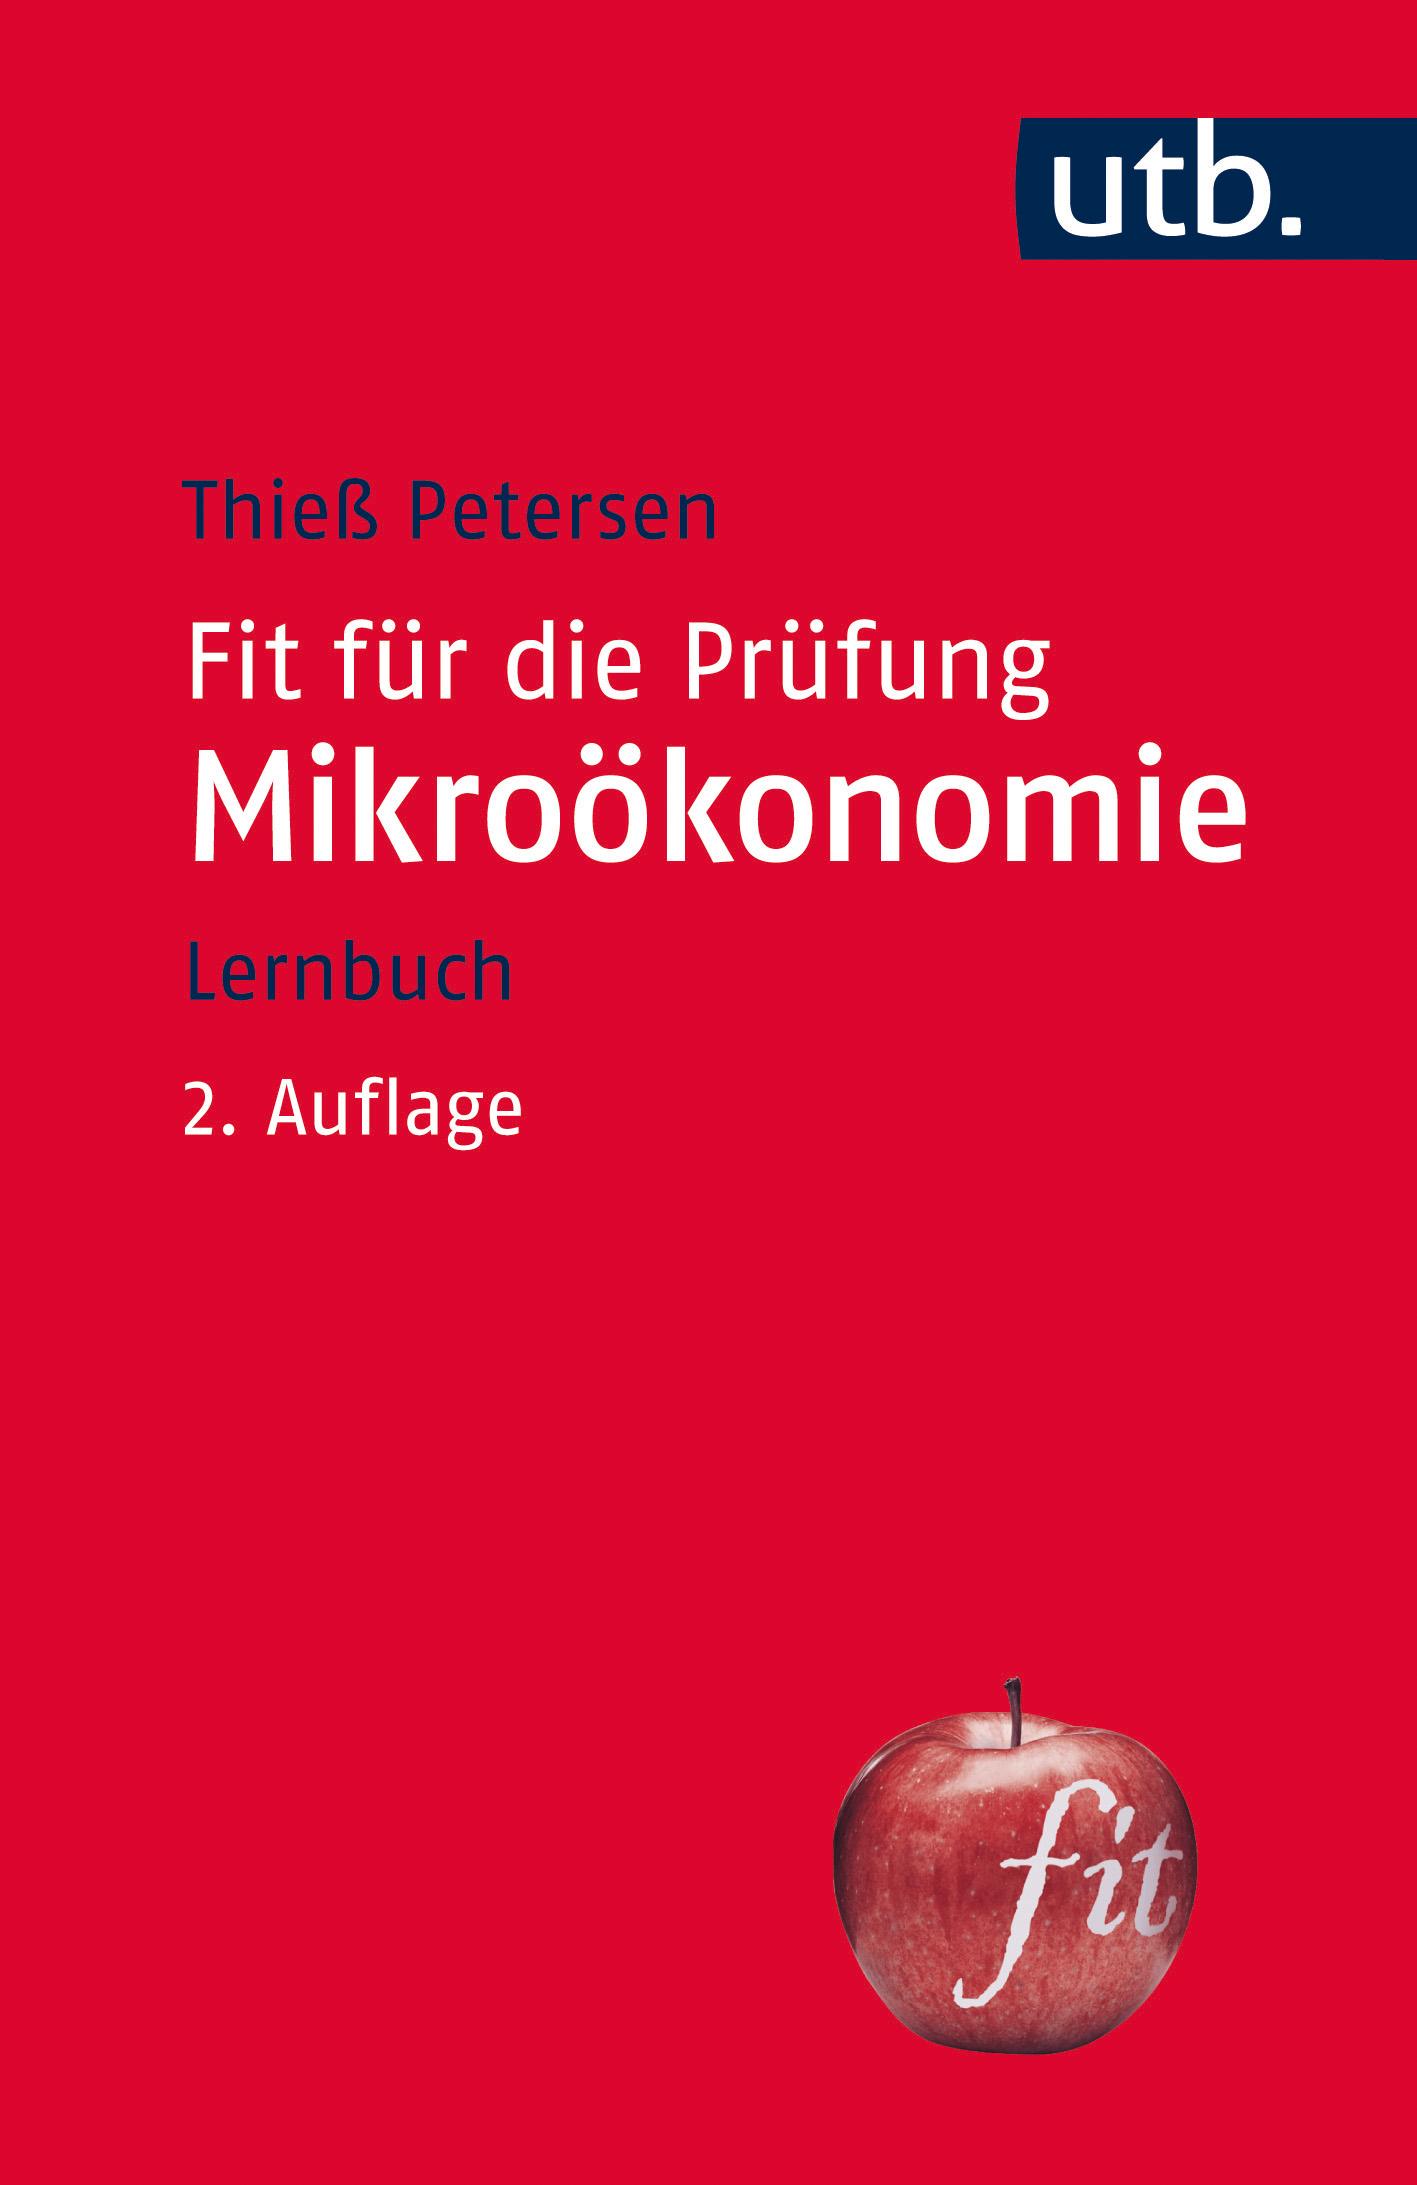 Fit für die Prüfung: Mikroökonomie - Thieß Pete...